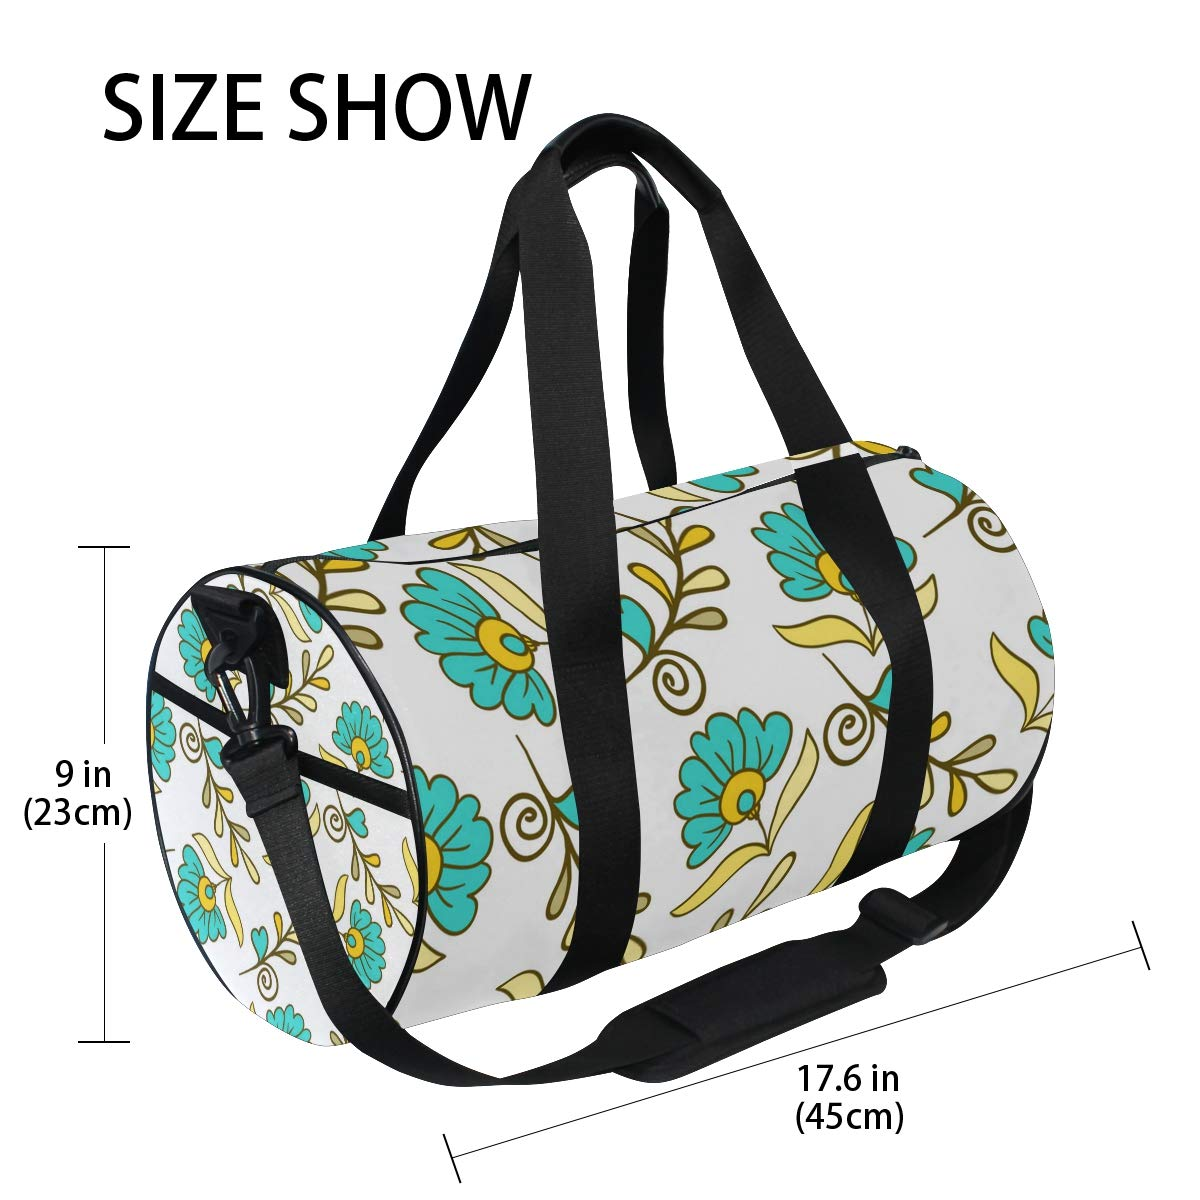 Blue Flower CeramicWaterproof Non-Slip Wearable Crossbody Bag fitness bag Shoulder Bag